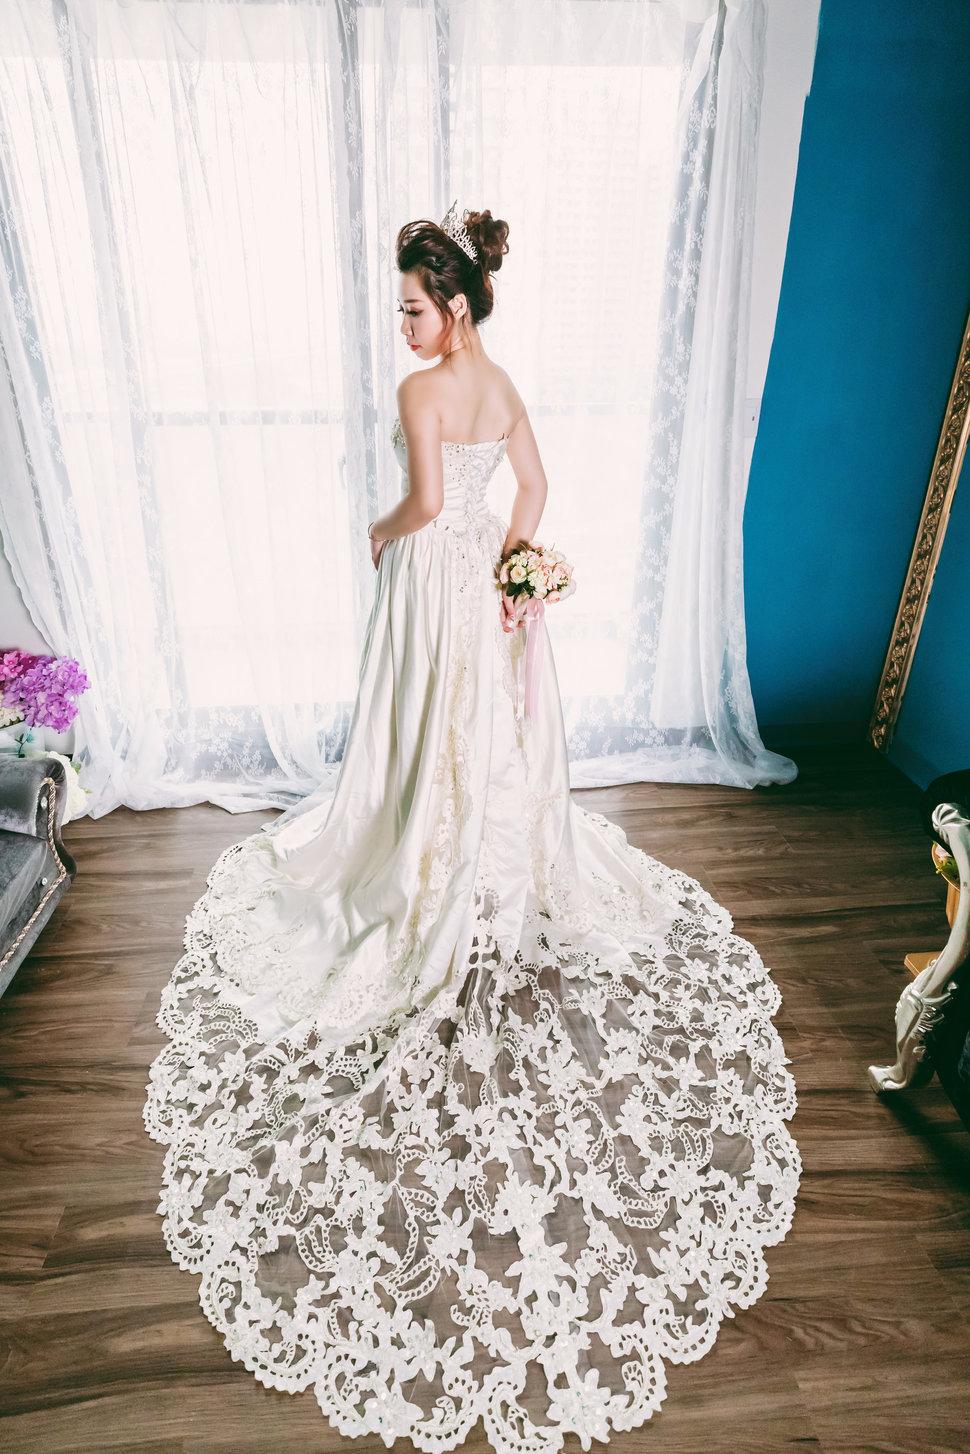 5D4_9015 - Promaker婚禮紀錄攝影團隊婚攝豪哥《結婚吧》